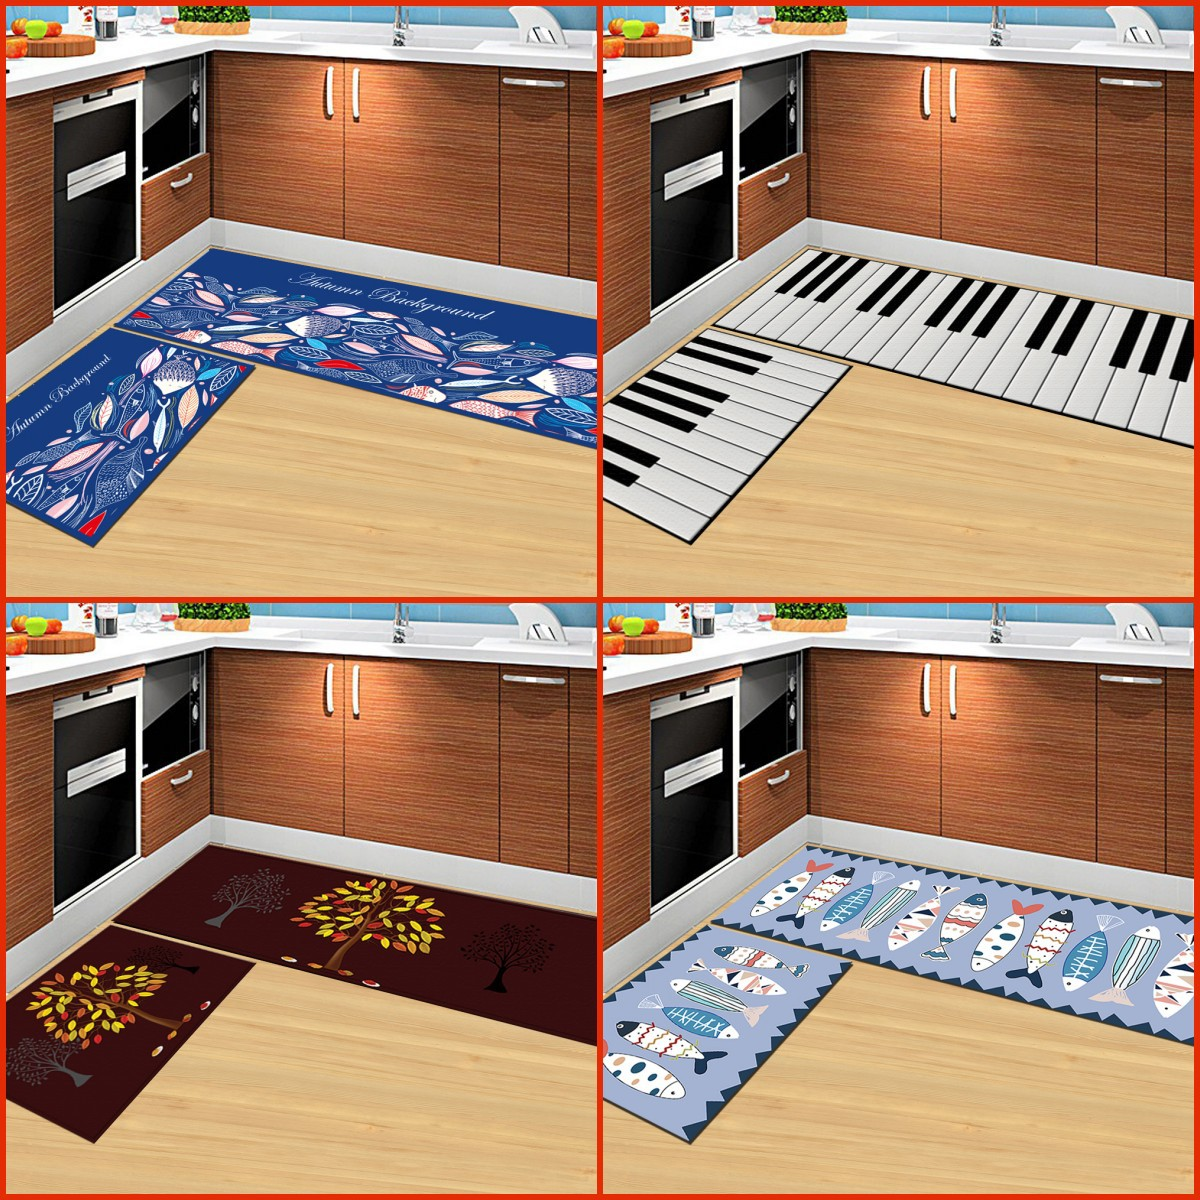 Big Szie Cartoon Mat Doormat Non-Slip Kitchen Carpet Bath Mat Home Entrance Floor Mat Hallway Area Rugs Kitchen Non-Slip Mat